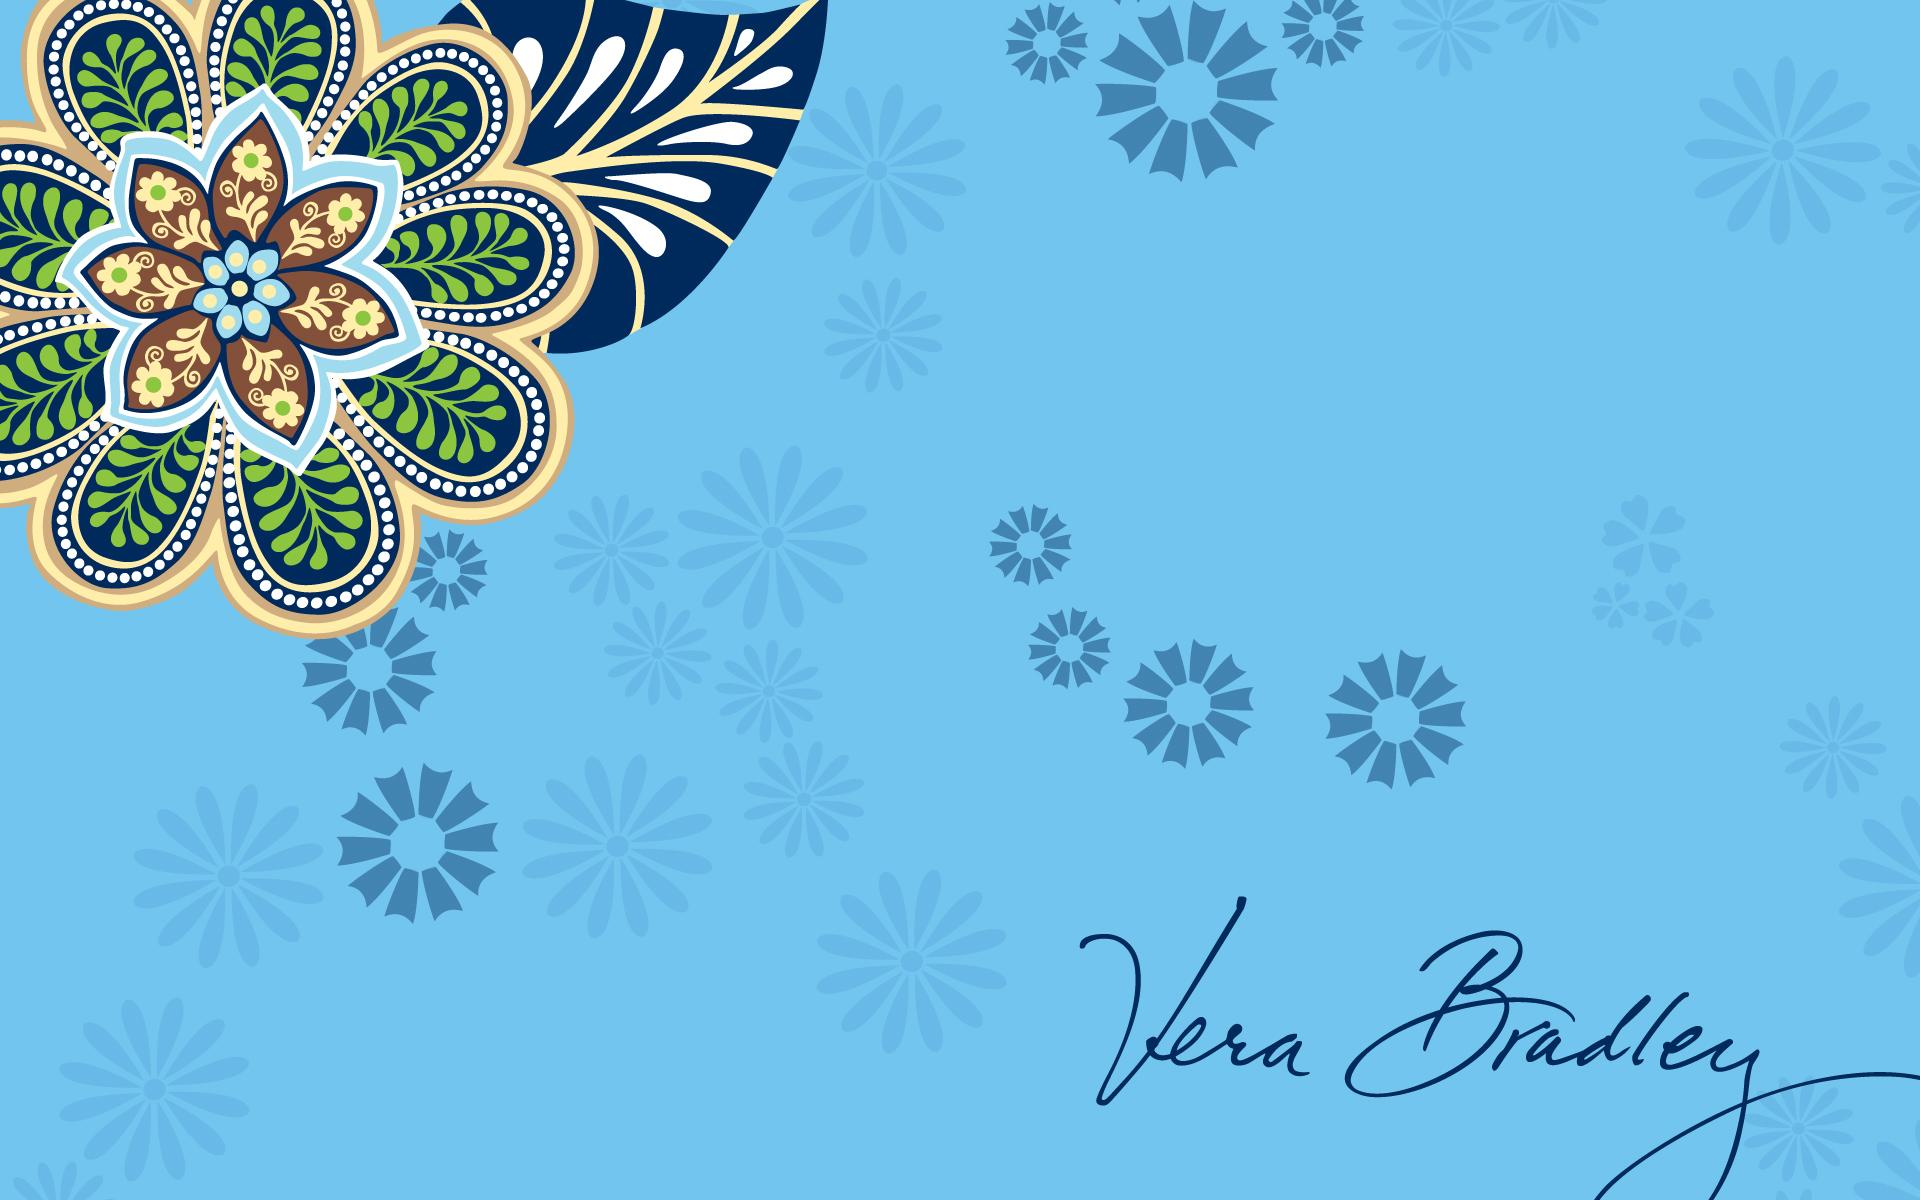 Free Download Vb Wallpapers Vera Bradley Wallpaper 35126636 1920x1200 For Your Desktop Mobile Tablet Explore 50 Vera Bradley Wallpaper Downloads Vera Bradley Wallpaper Downloads Vera Bradley Wallpapers Vera Bradley Wallpaper Hd